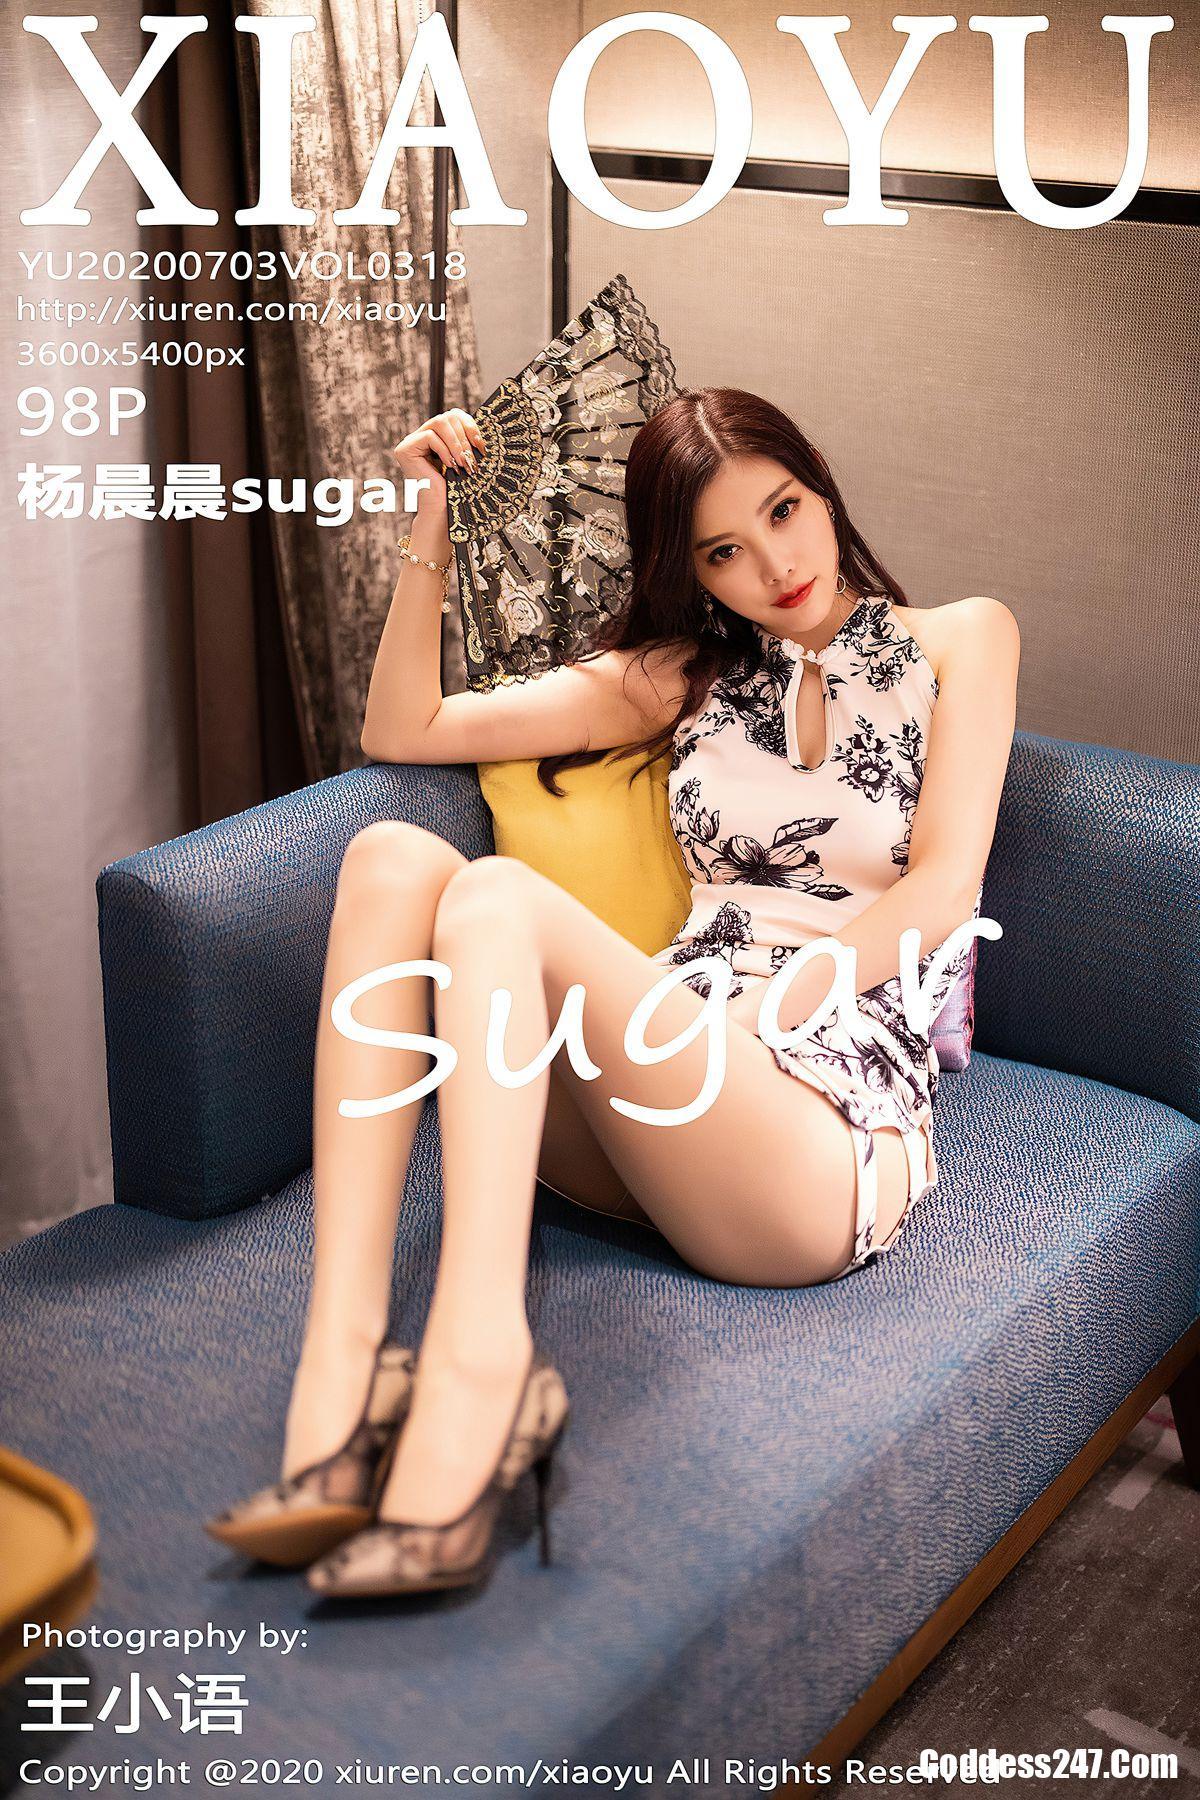 XiaoYu Vol.318 杨晨晨sugar